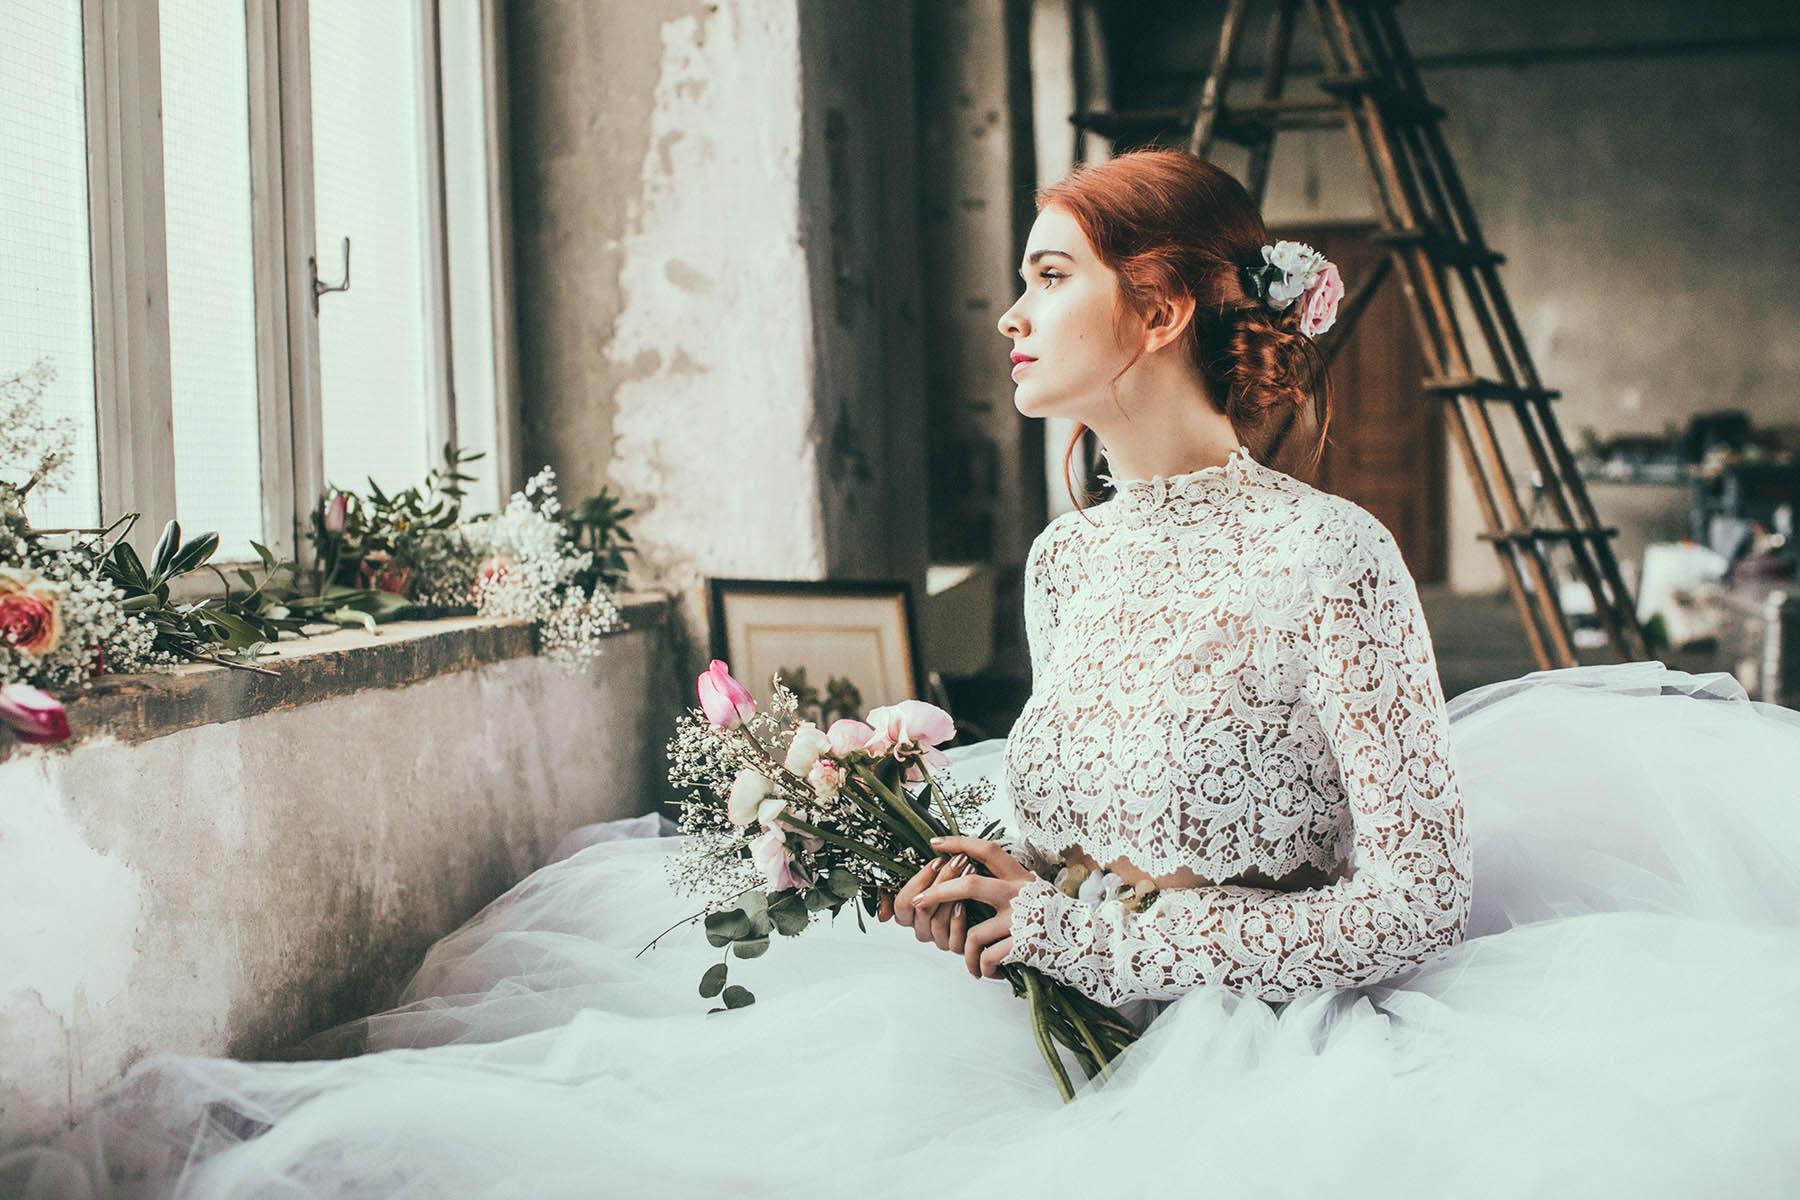 We-Are-Flowergirls_Lookbook_Flowercrown_Blumenkranz_SS17_c_Lupi-Spuma_Web_27.jpg